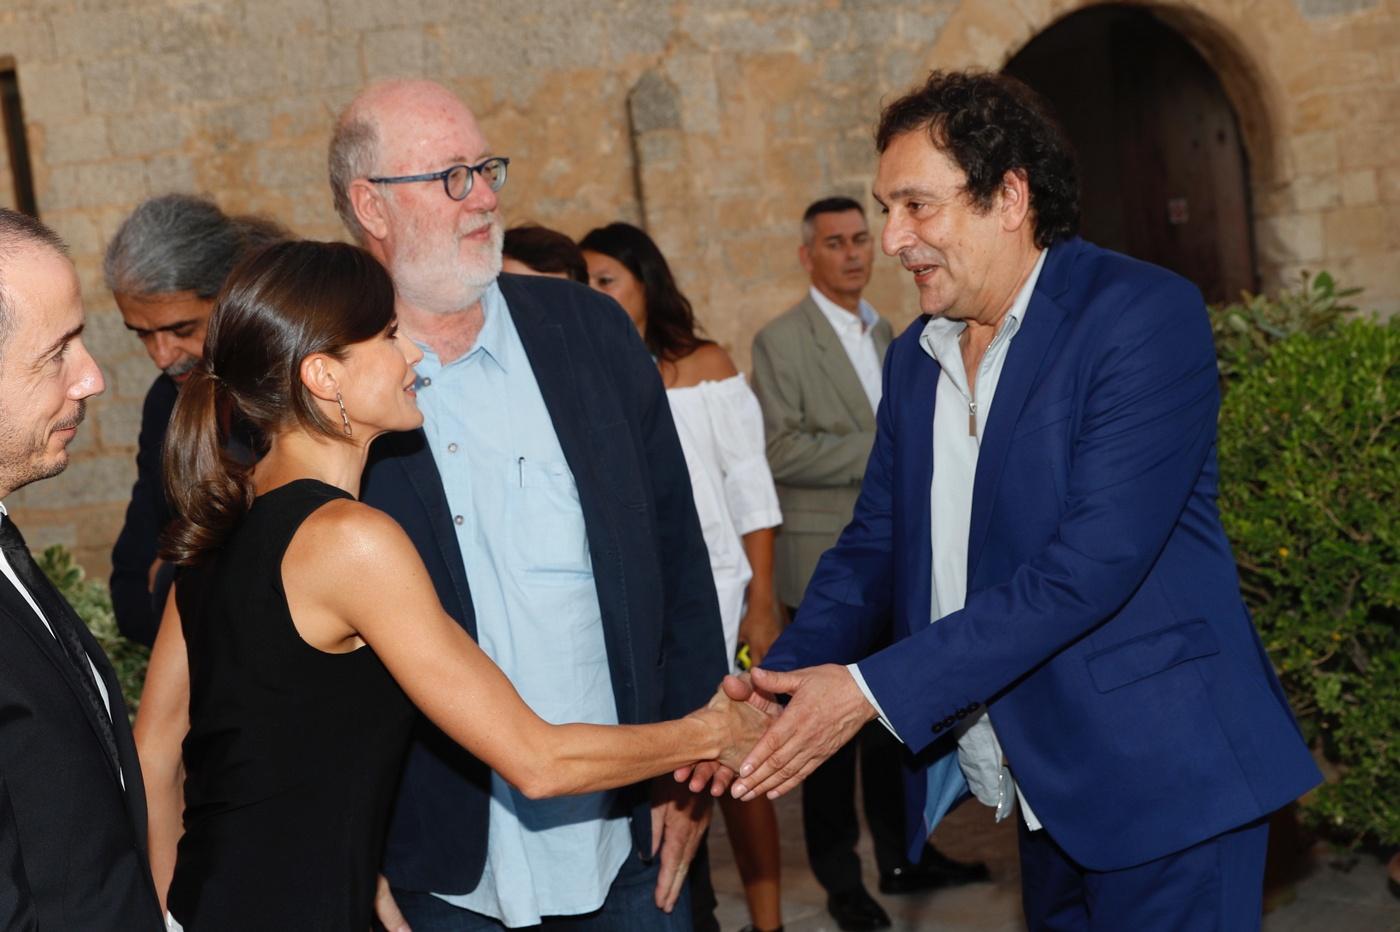 La reina española junto al director de cine Agusti Villaronga en la ceremonia celebrada en Palma de Mallorca. (Casa de S.M. el Rey)